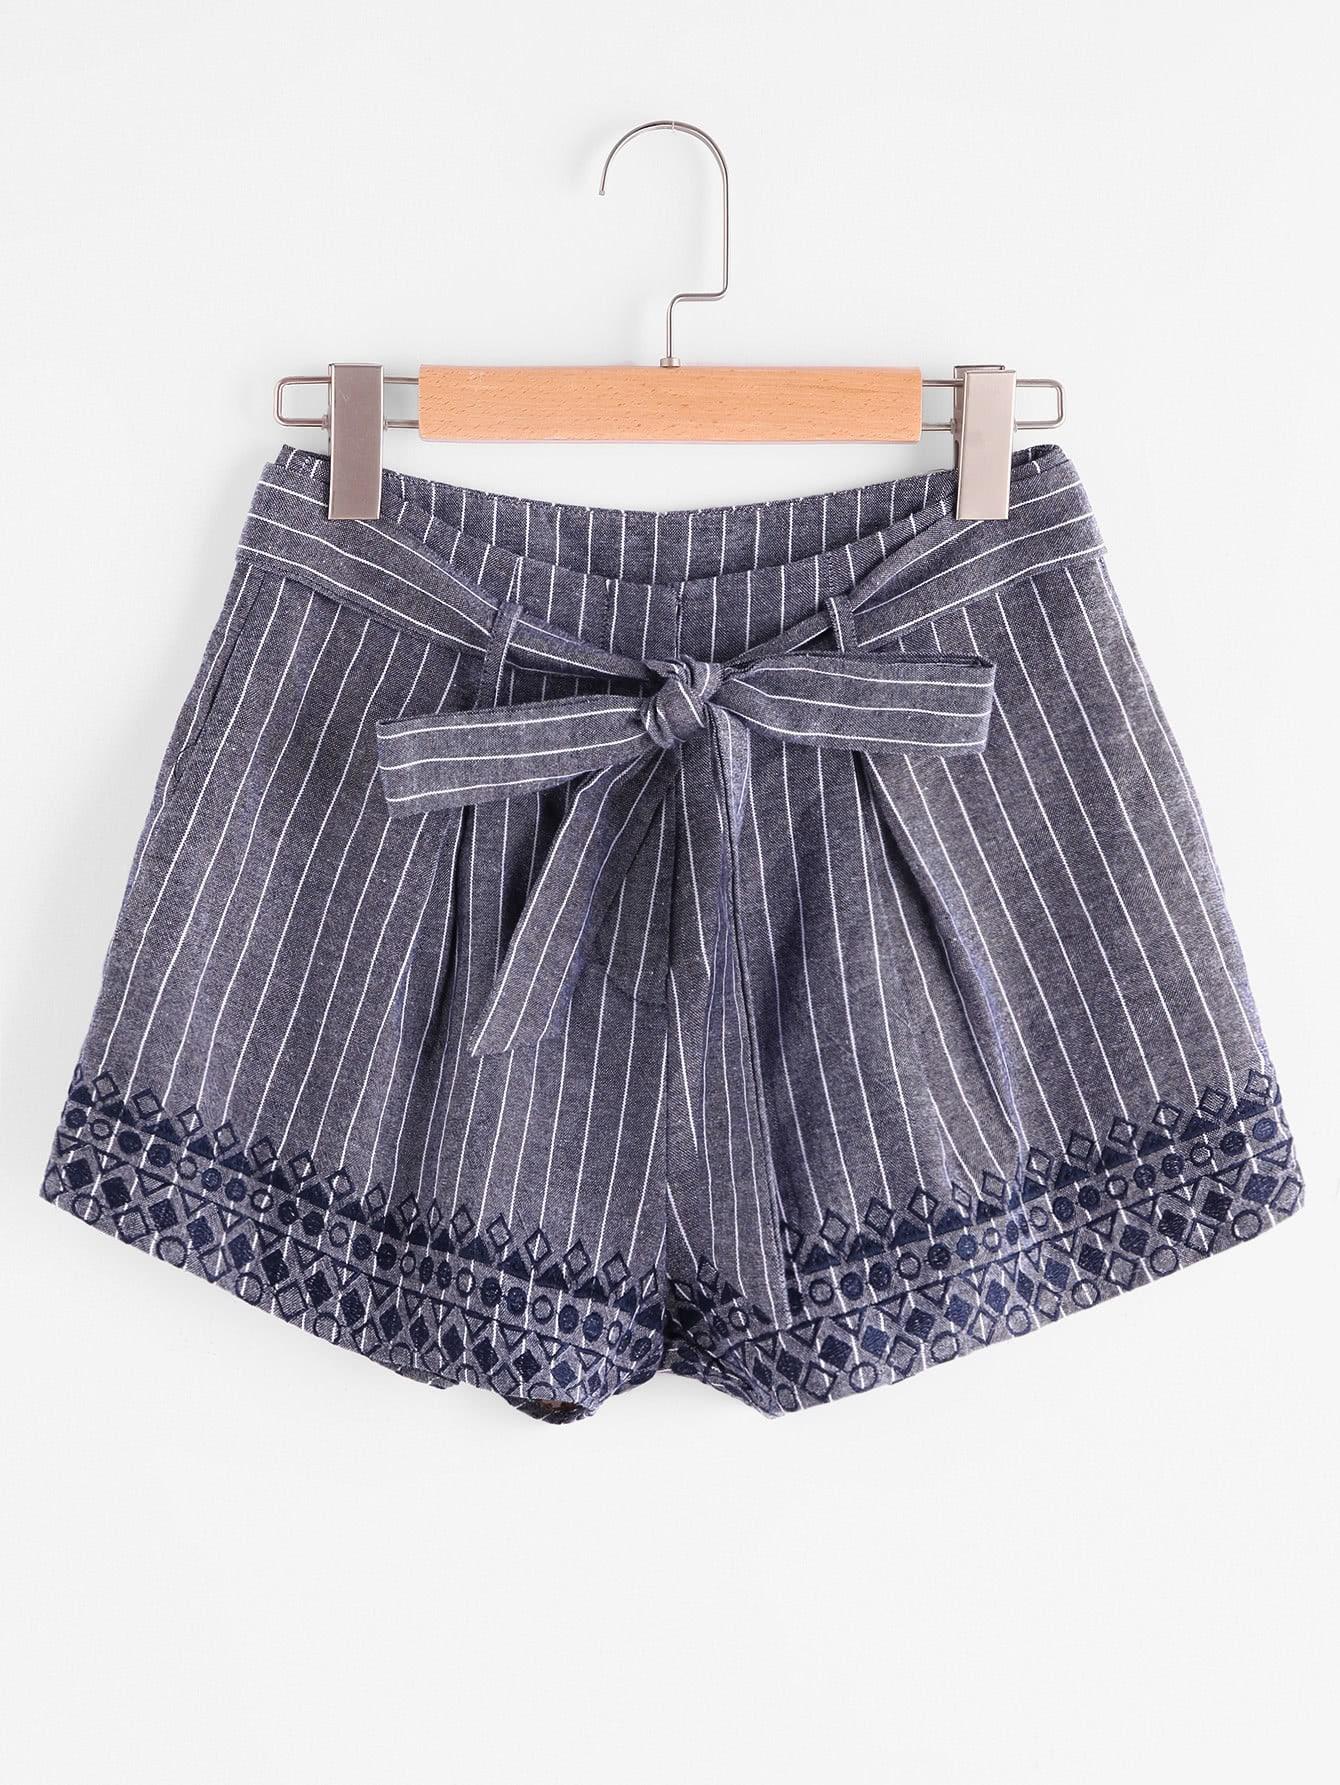 Фото Self Belt Embroidered Pinstripe Shorts. Купить с доставкой